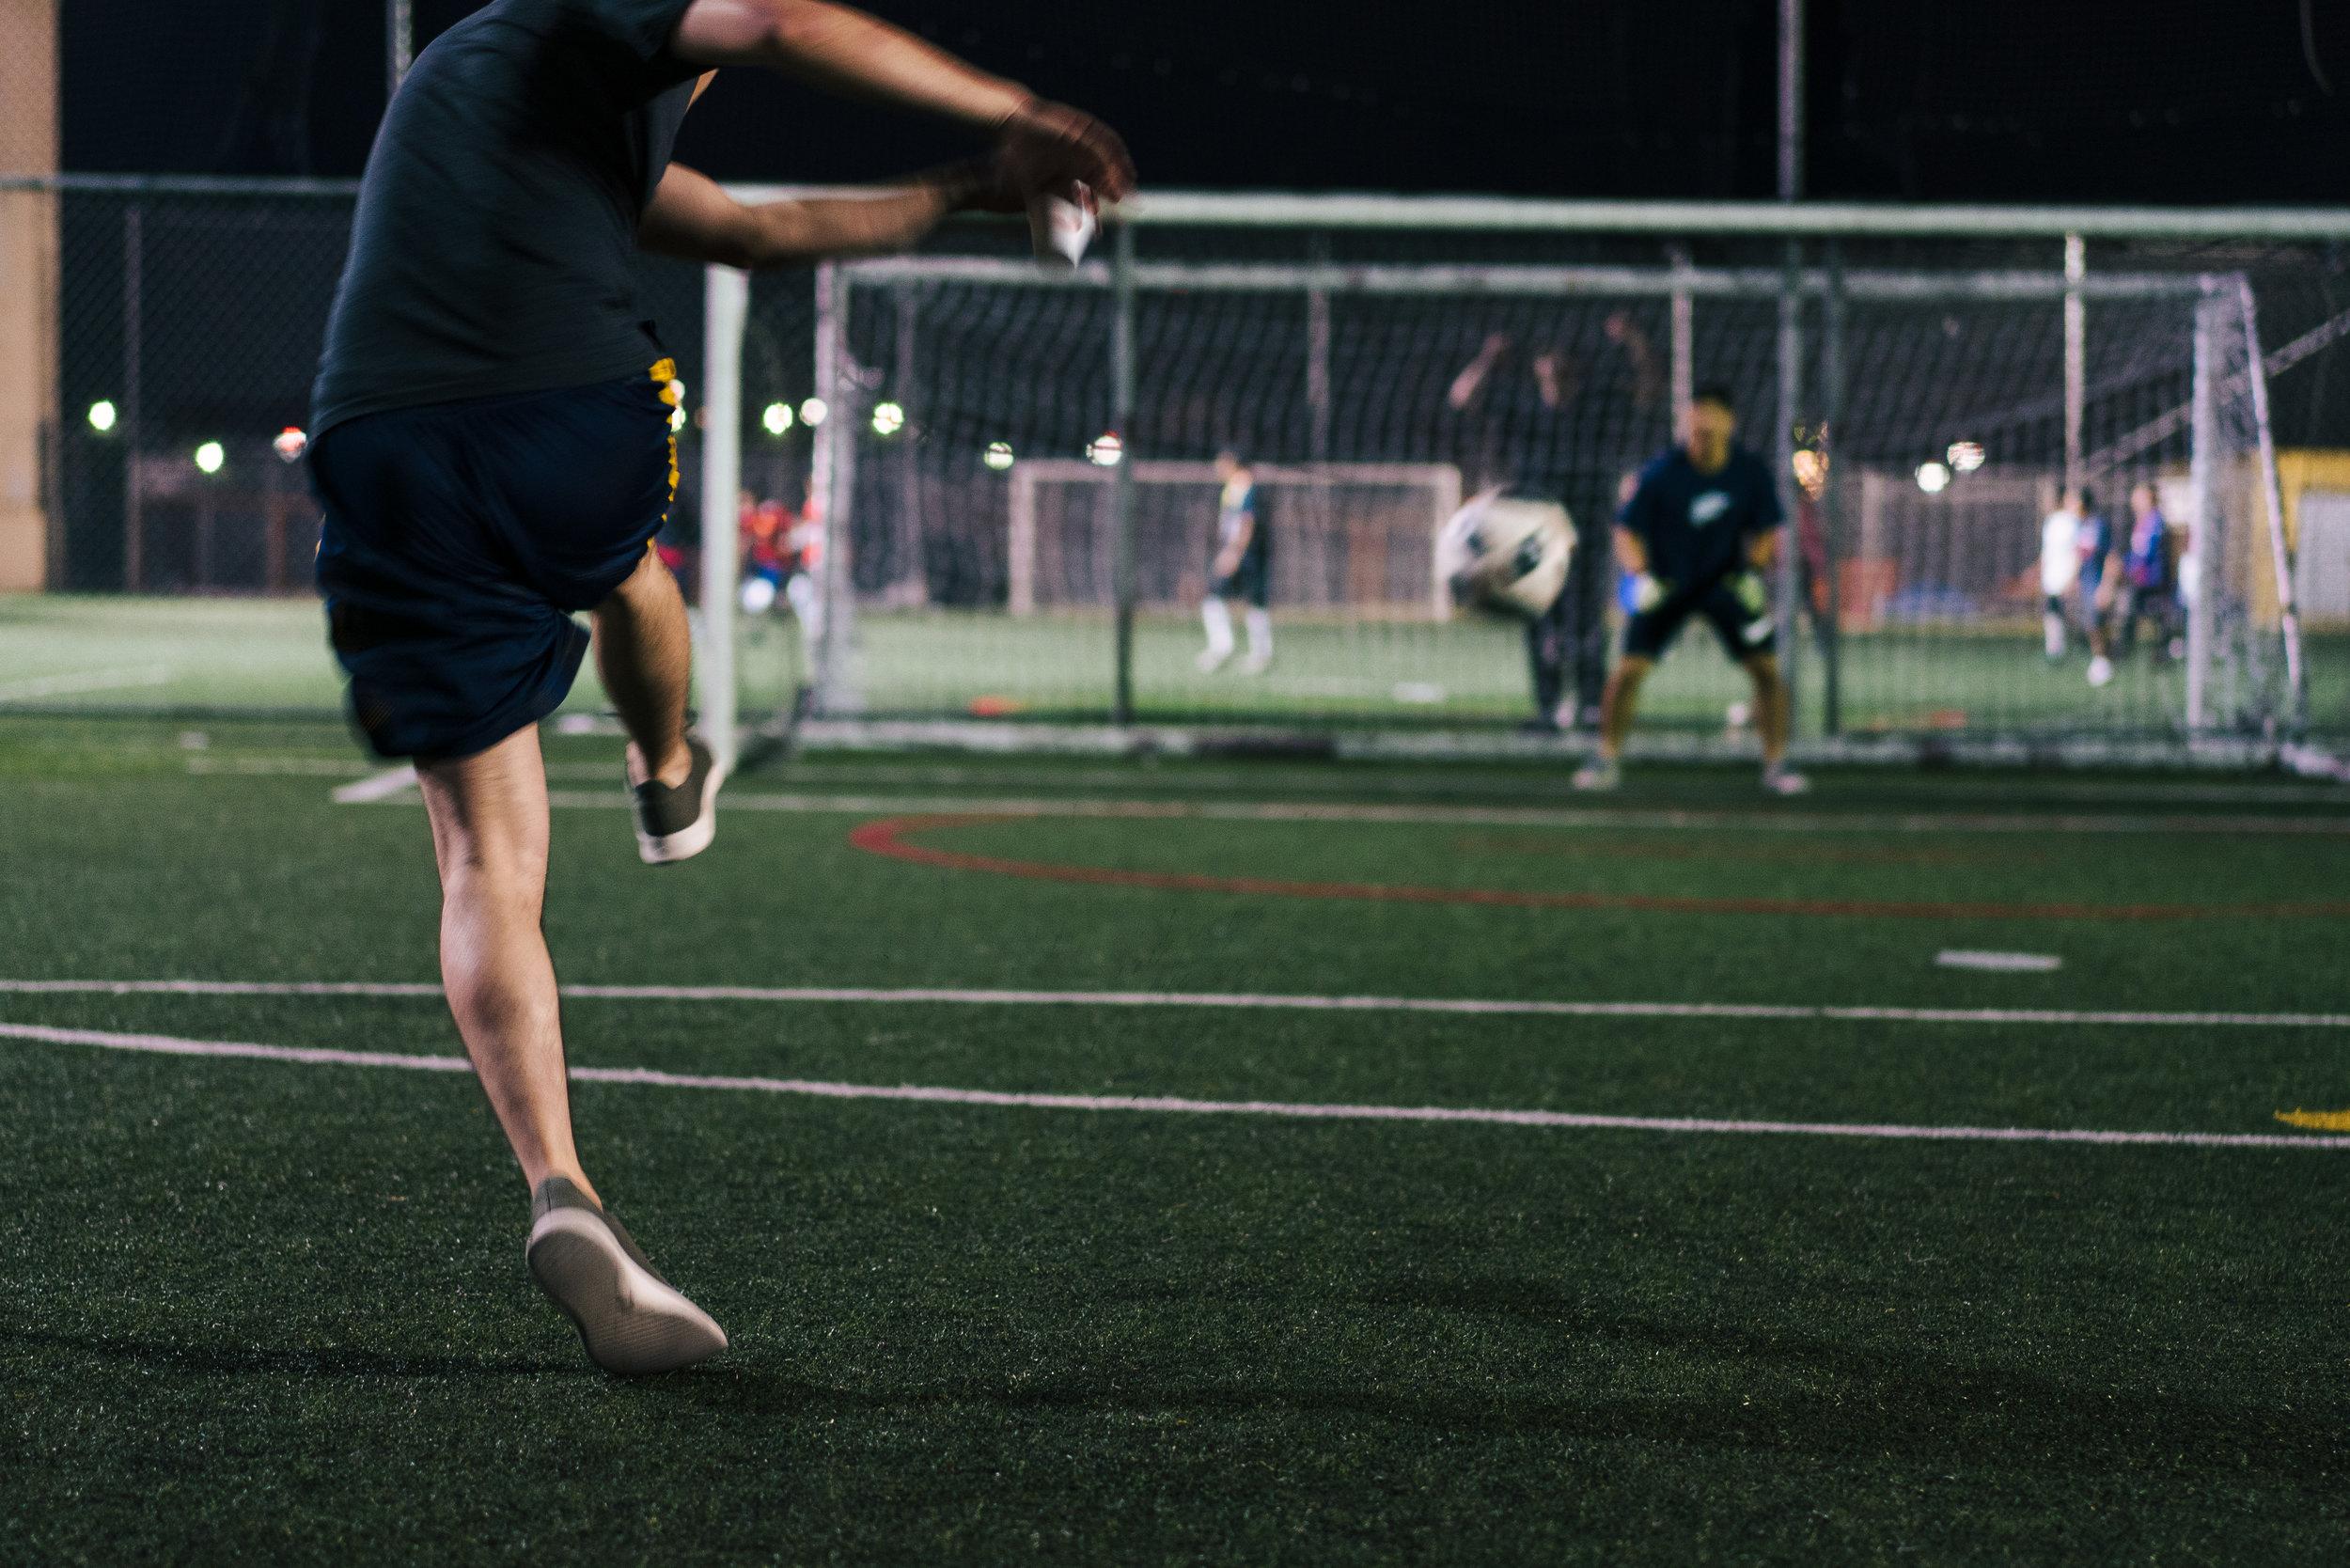 Kick That Ball.jpg